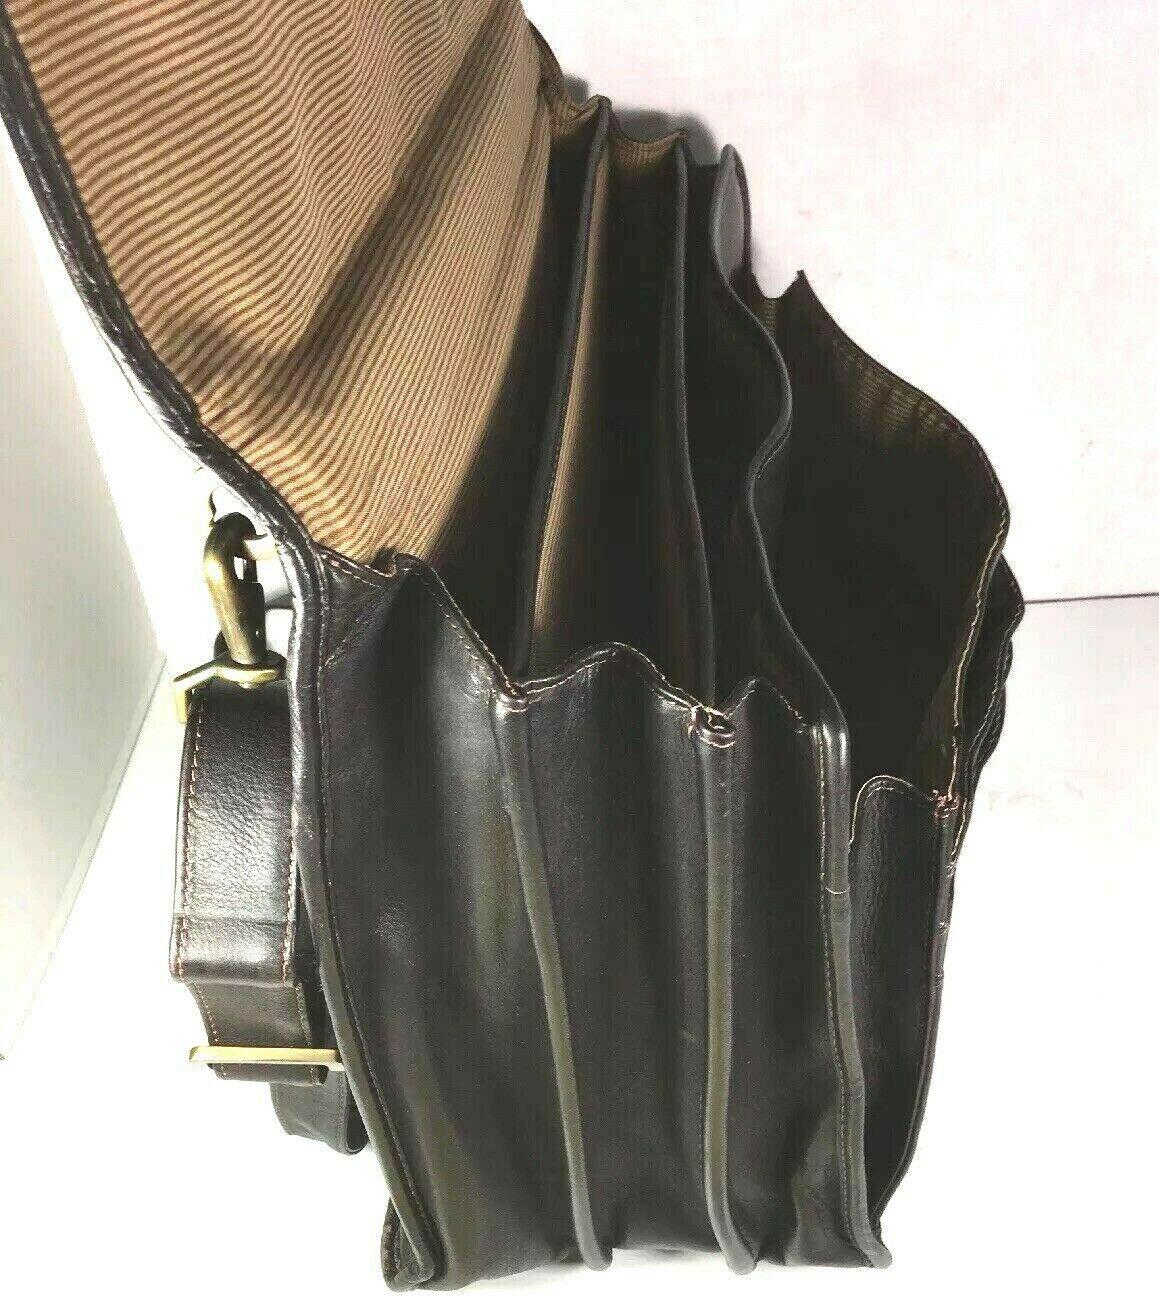 Santa Fe Dilana Vintage Dark Brown Leather Briefcase Laptop Bag – Distressed image 2